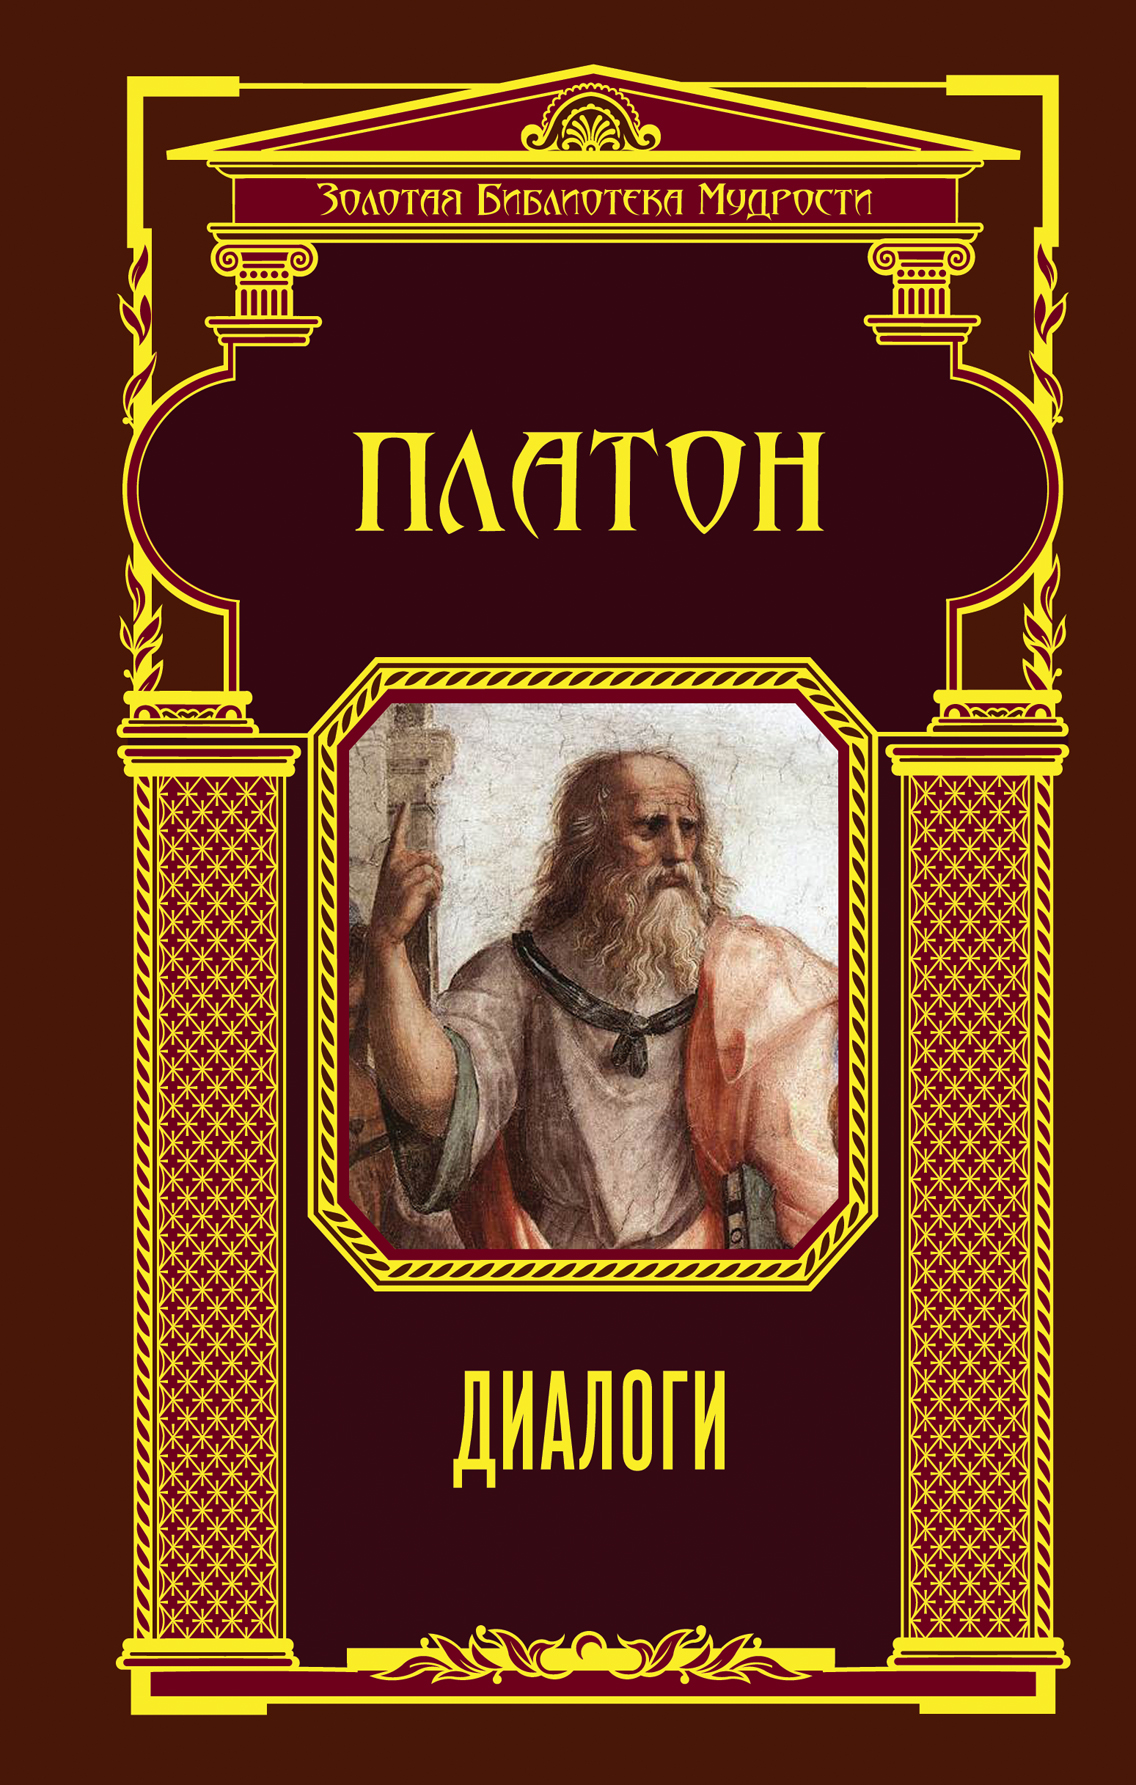 Платон Диалоги (ЗБМ)